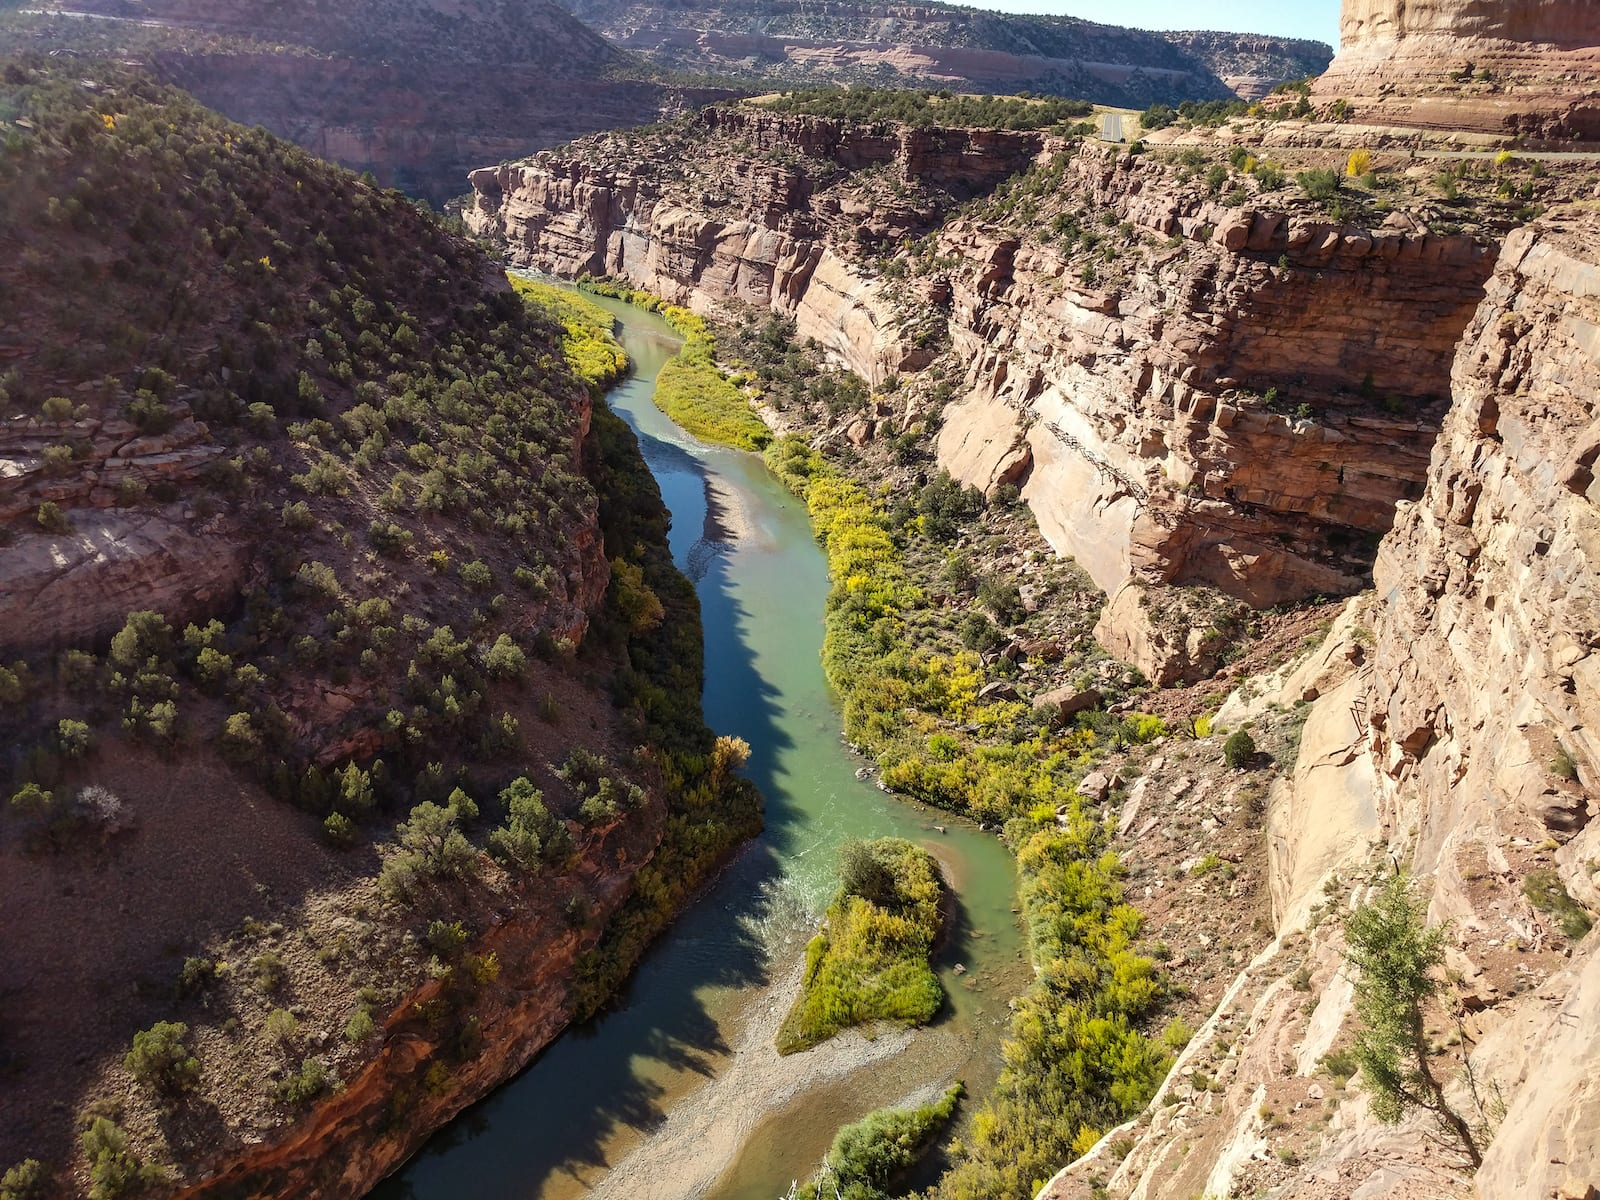 Dolores River Canyon, CO